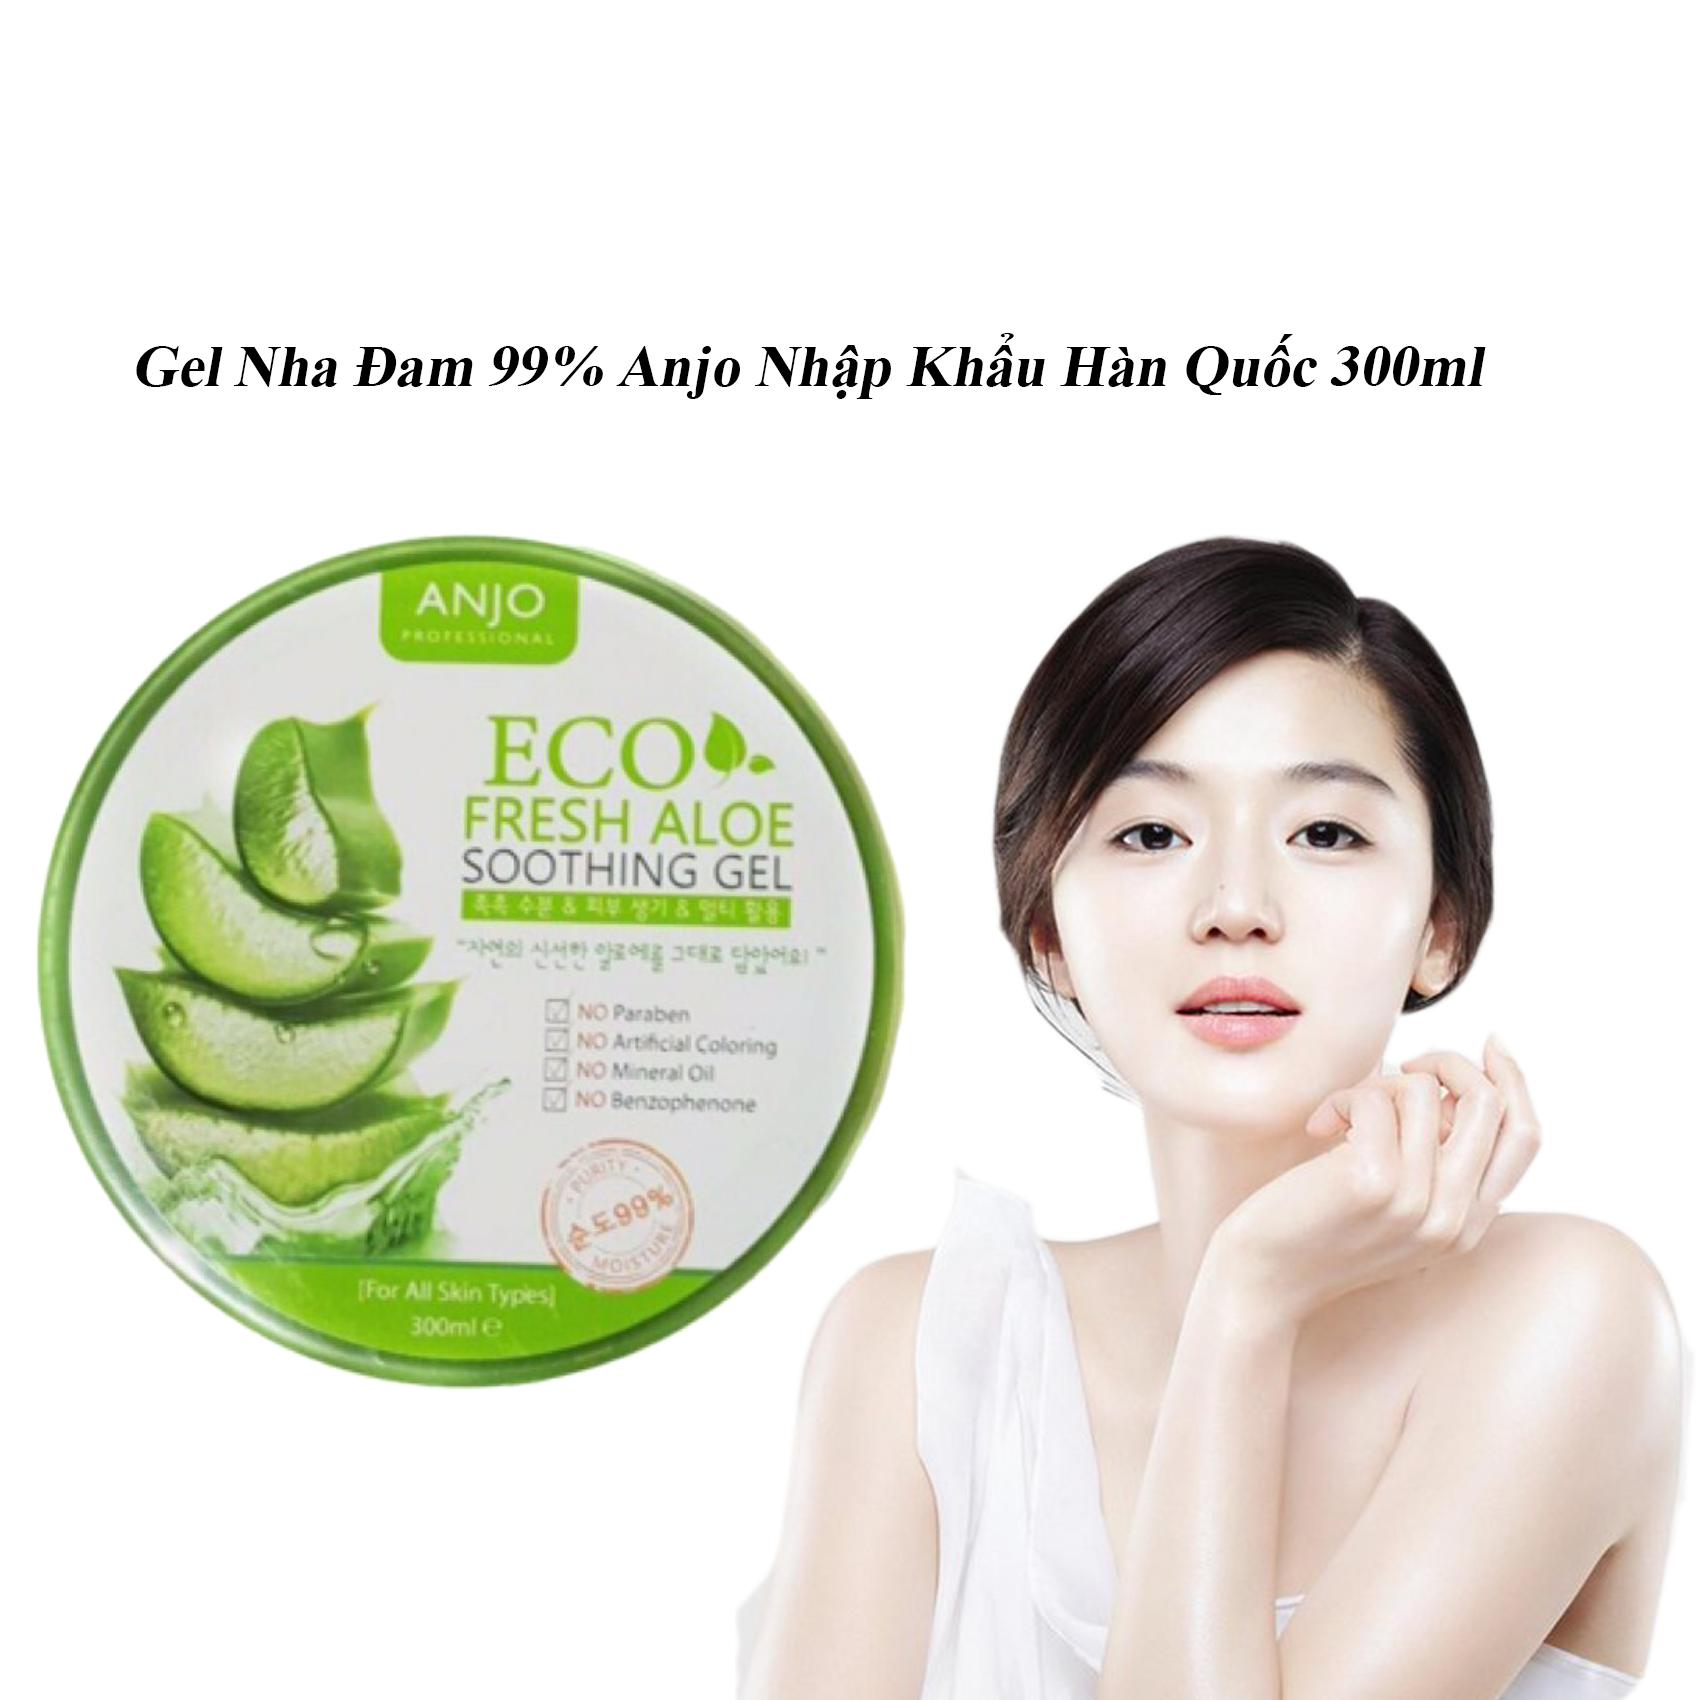 body-gel-nha-dam-99-anjo-nhap-khau-300ml-han-quoc-2193